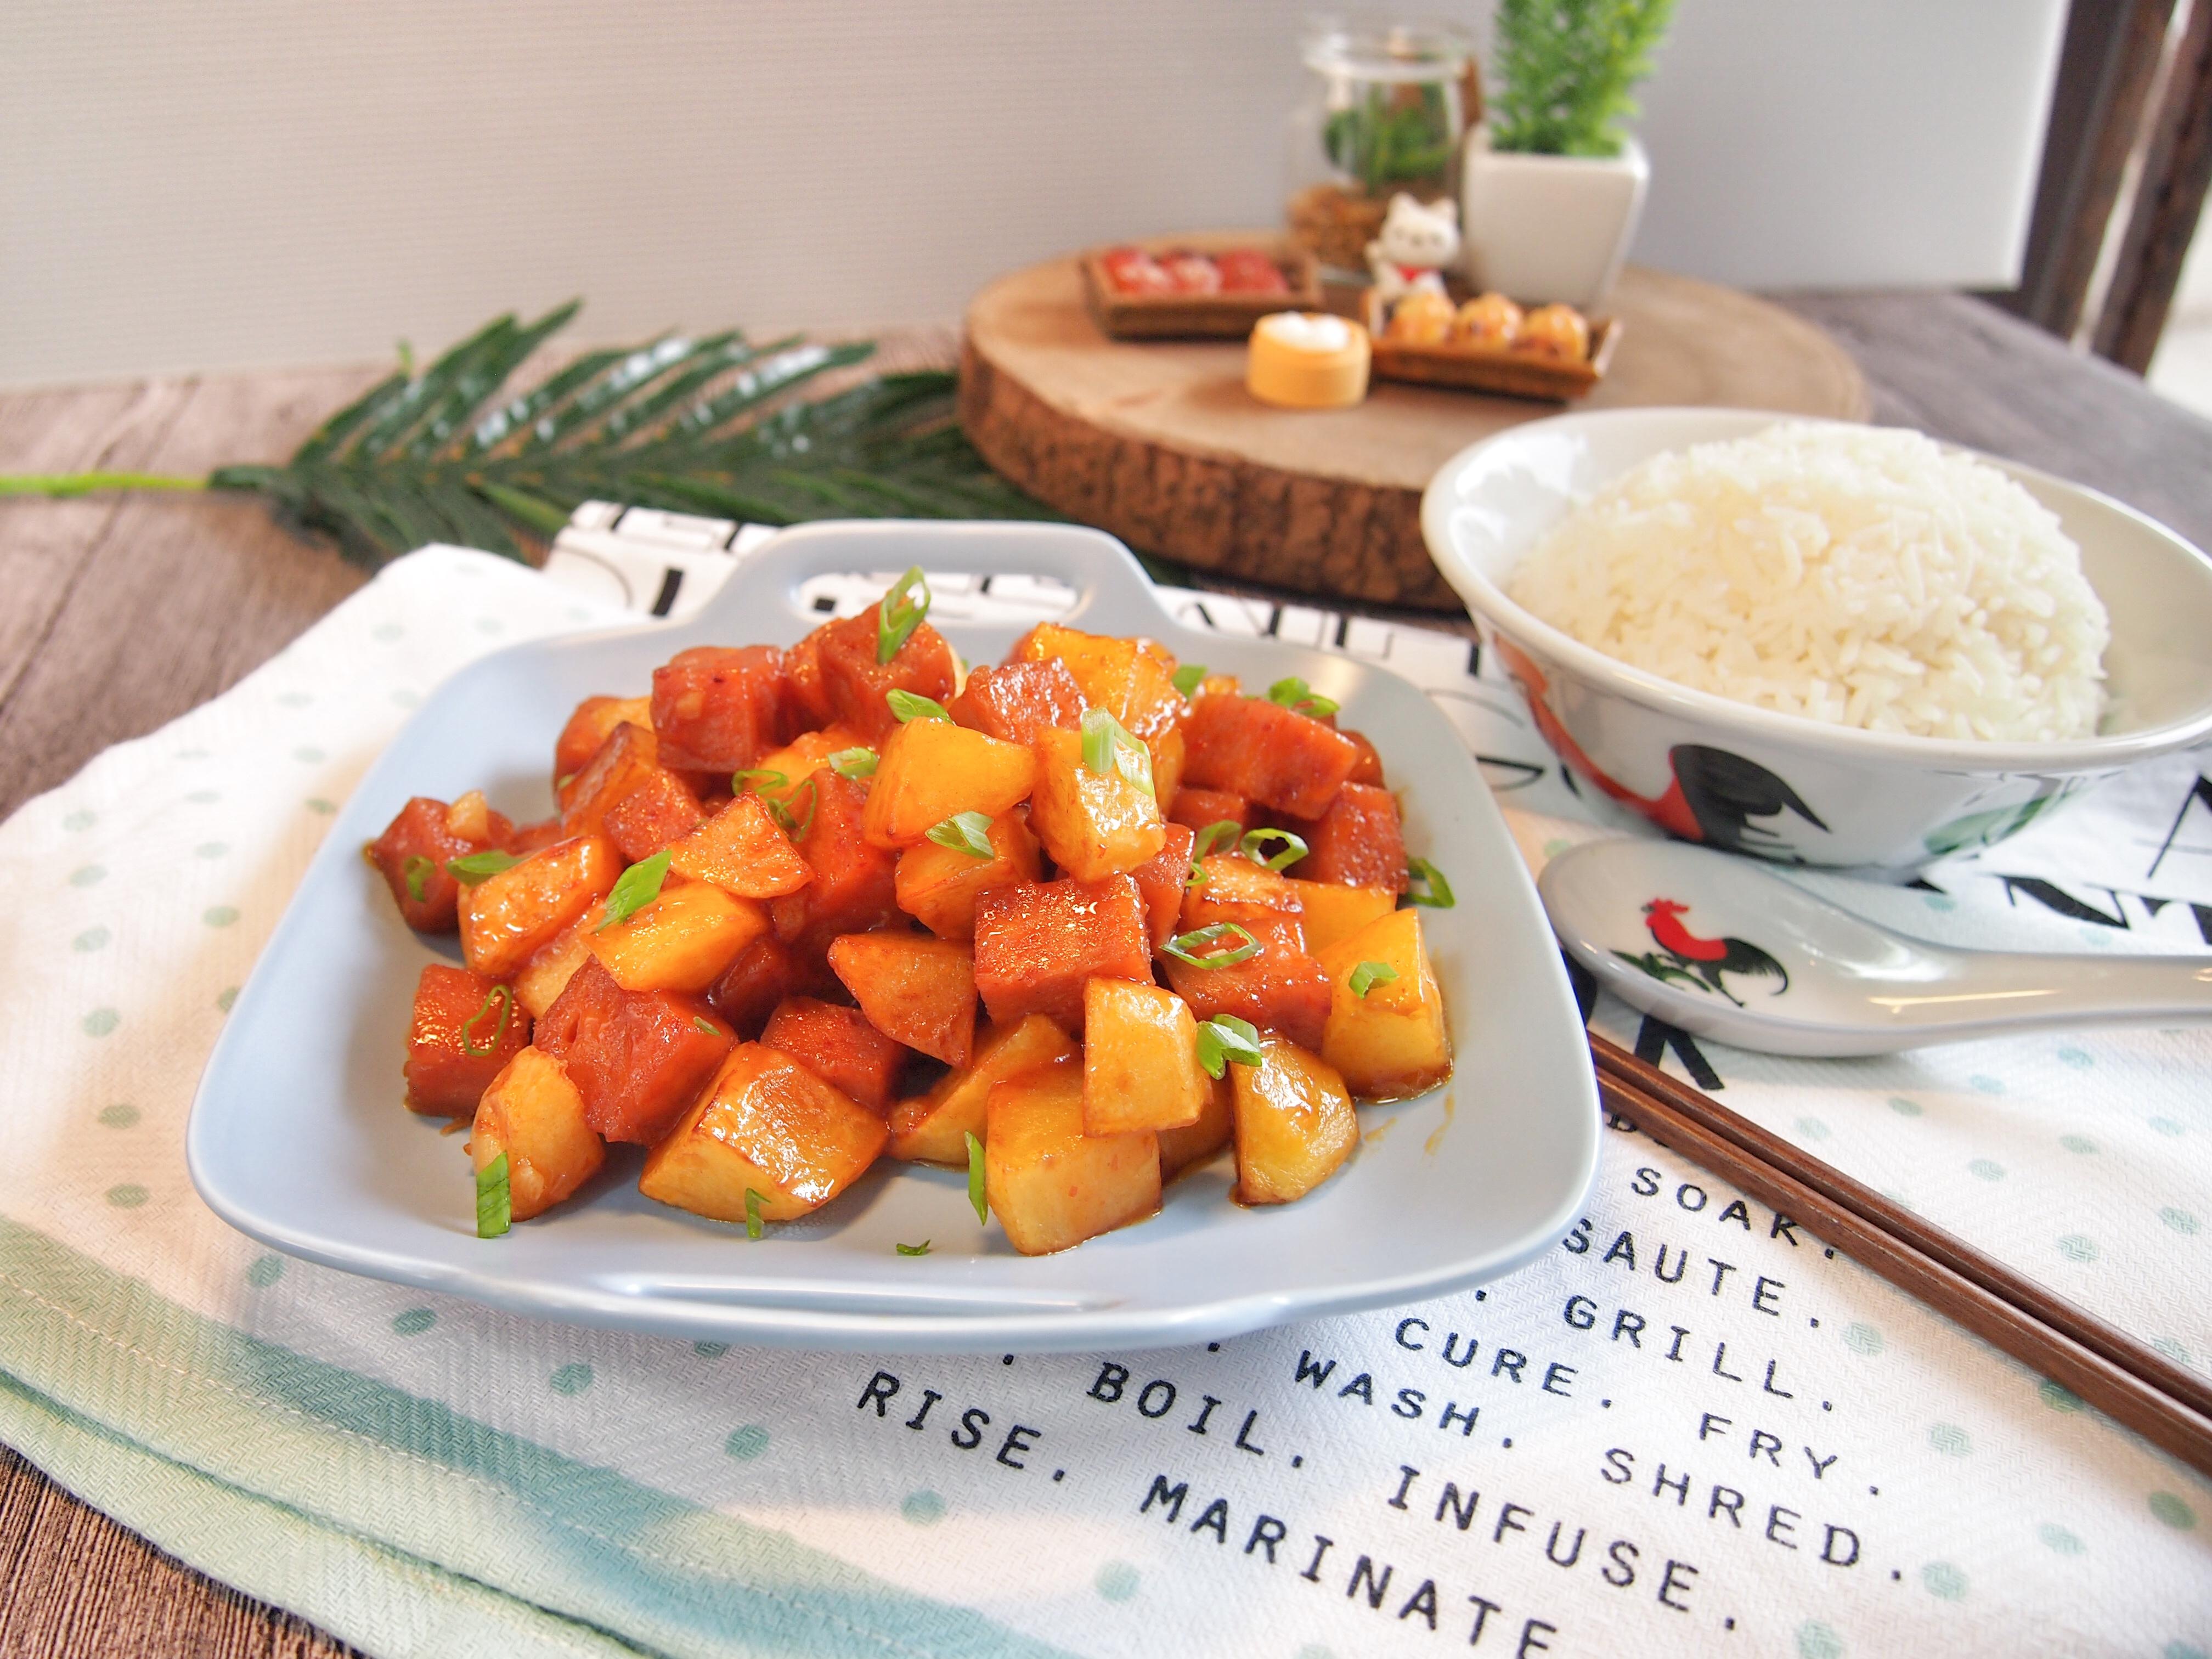 KIDS' FAVOURITE Stir Fried Luncheon Meat w/ Potatoes Recipe 餐肉马铃薯